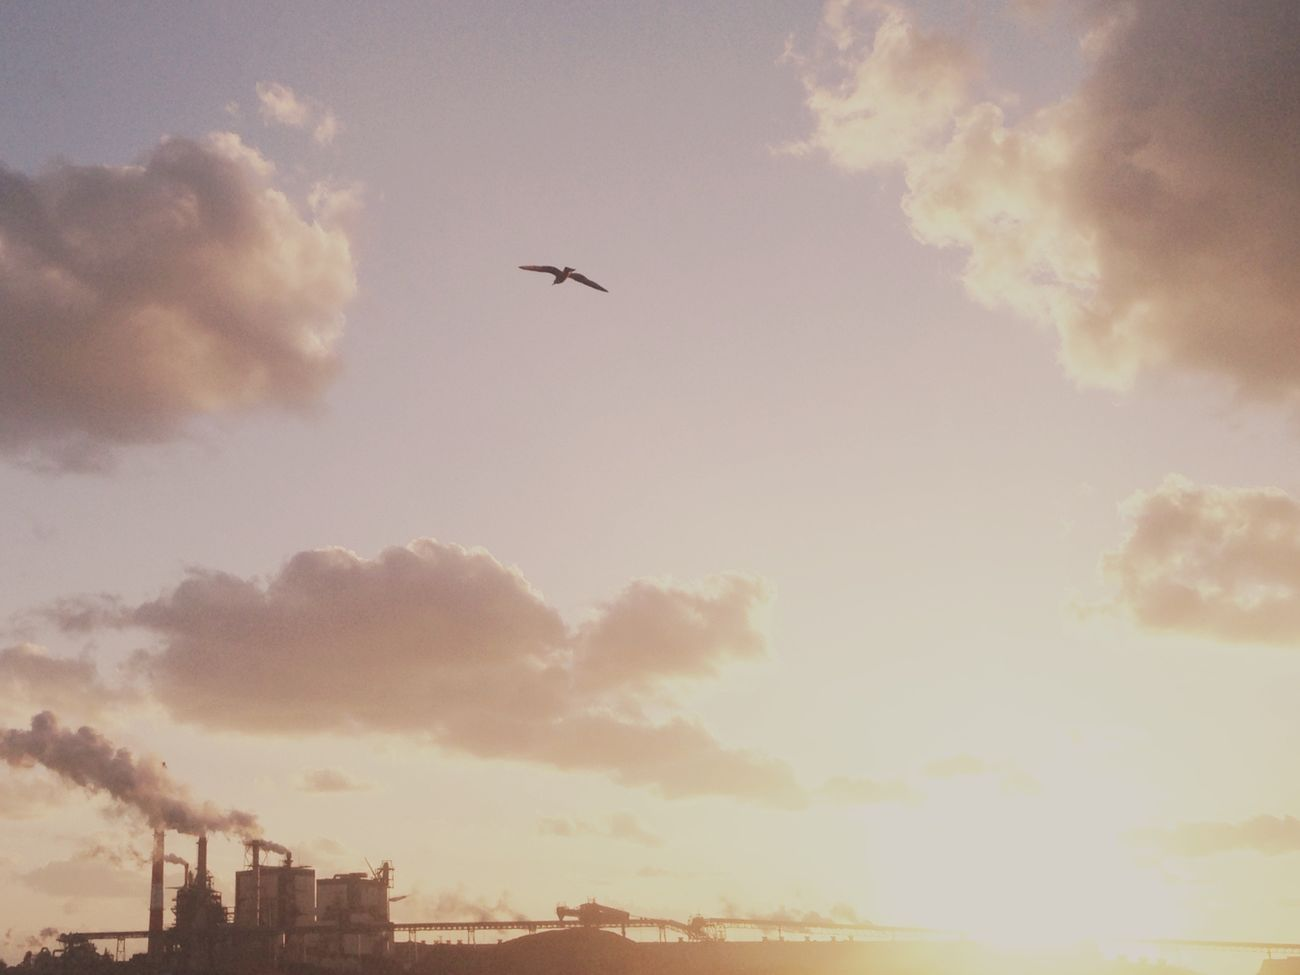 IPhone IPhoneography Mobilephotography Flying Sky Bird Evning Sky Sanset Collection EvningGlow Sanset Sunset